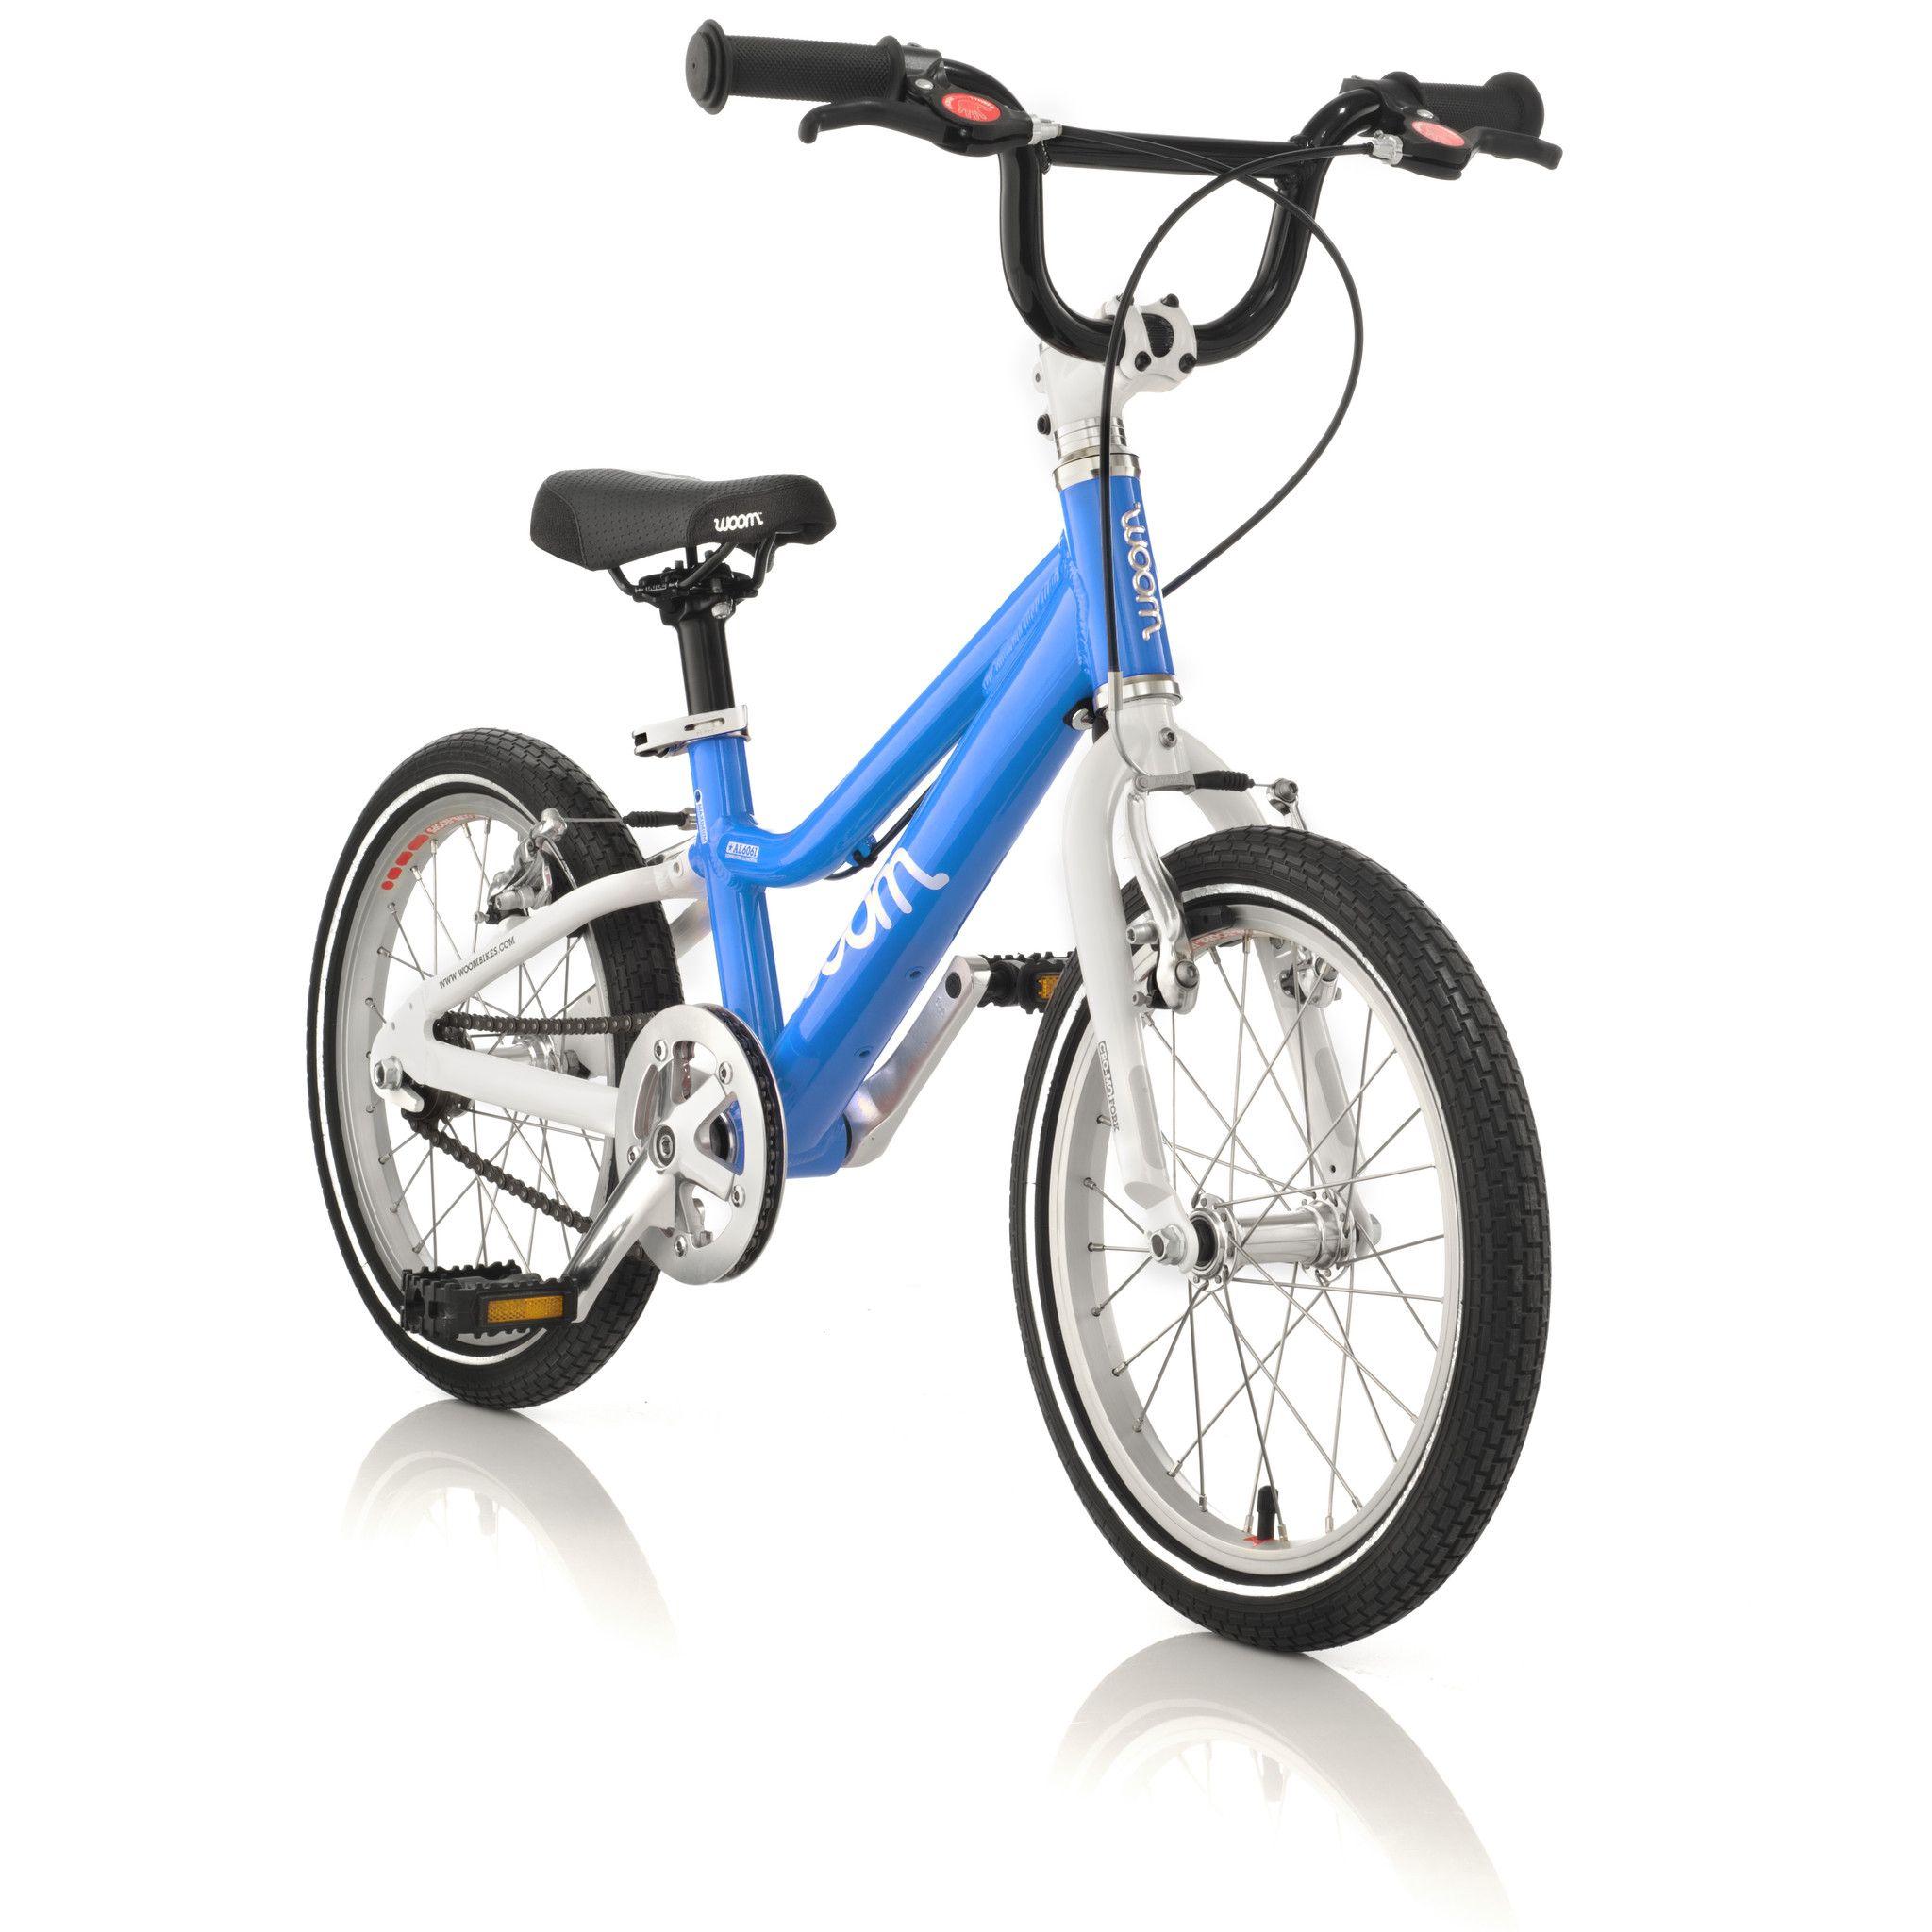 Woom 3 Bike 16 Inch 5 7 Years 105 125 Cm 16 7lb 7 6kg